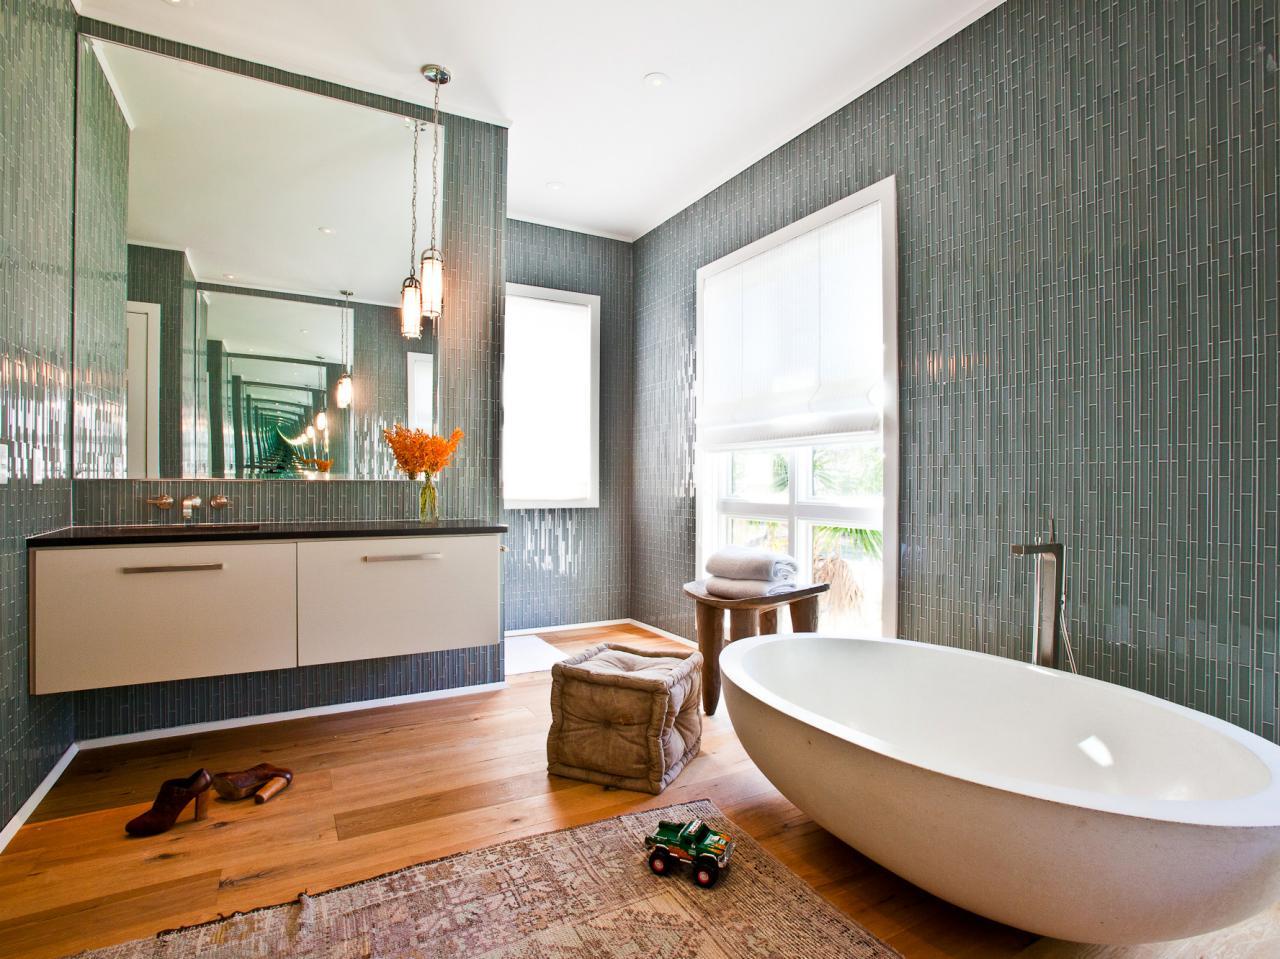 Original_Bathroom-Tile-Cortney-Bishop-Glass-Vertical-Tiles_s4x3.jpg.rend.hgtvcom.1280.960